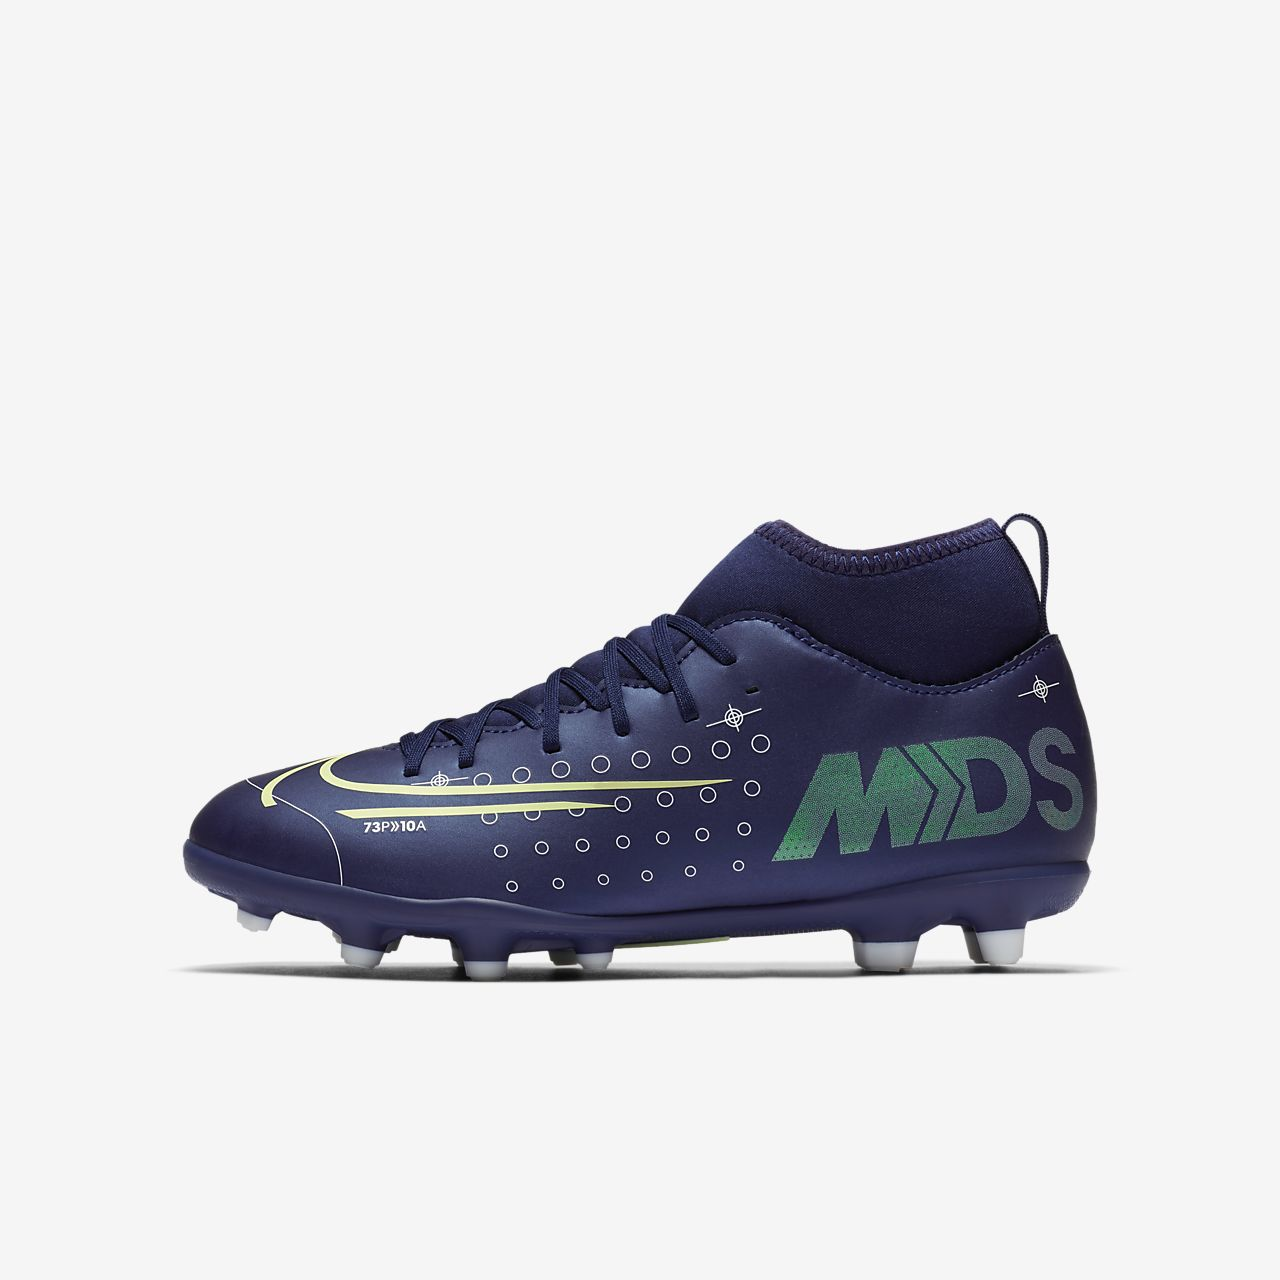 Nike Jr. Mercurial Superfly 7 Club MDS MG Voetbalschoen voor kleuters/kids (meerdere ondergronden)